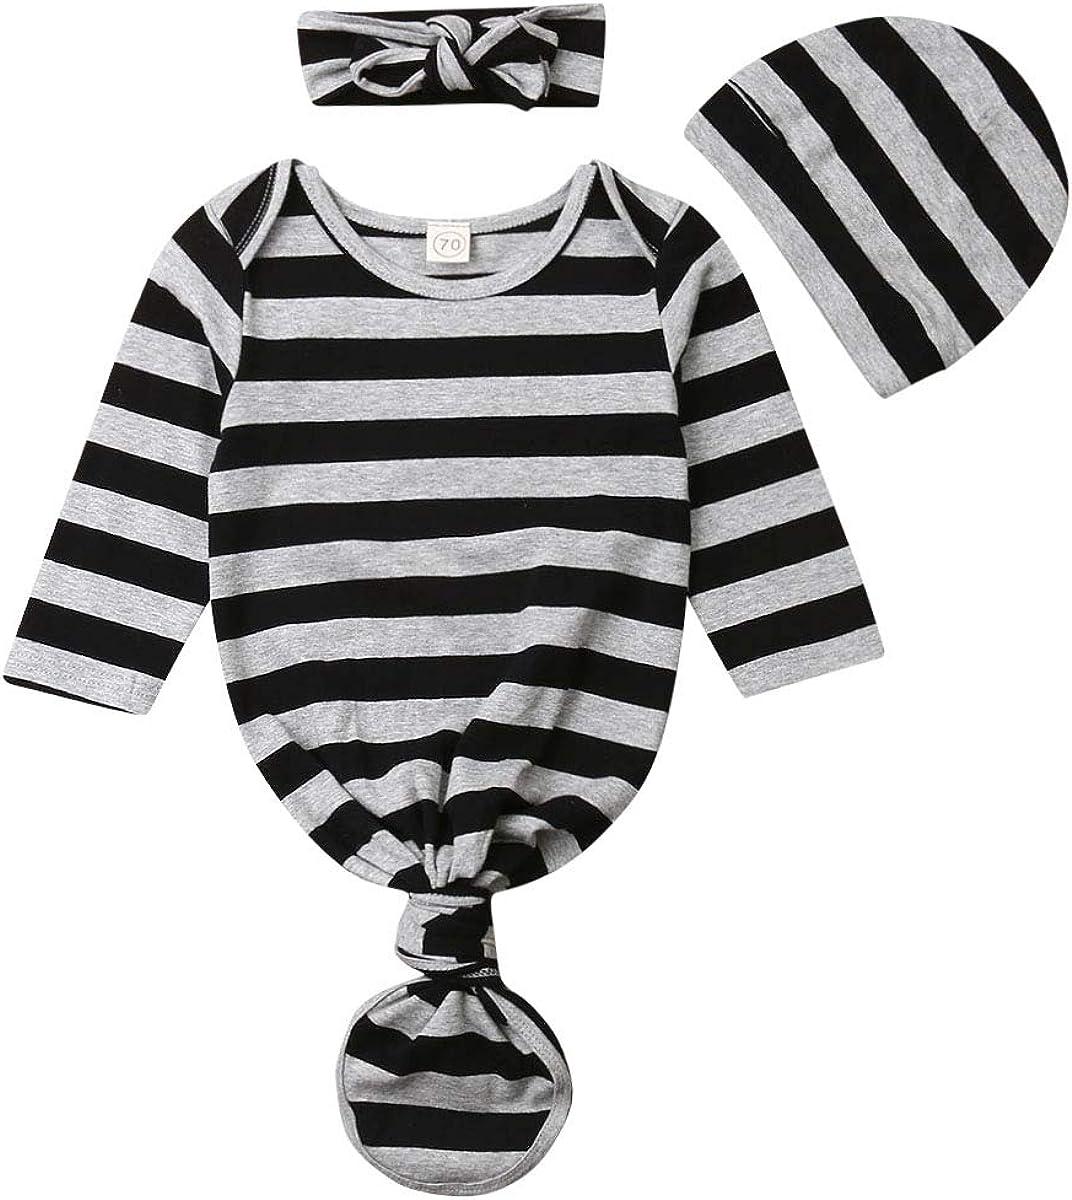 Newborn Unisex Baby Cotton Sleepwear Striped Headban Nightgown Long Beach Max 41% OFF Mall